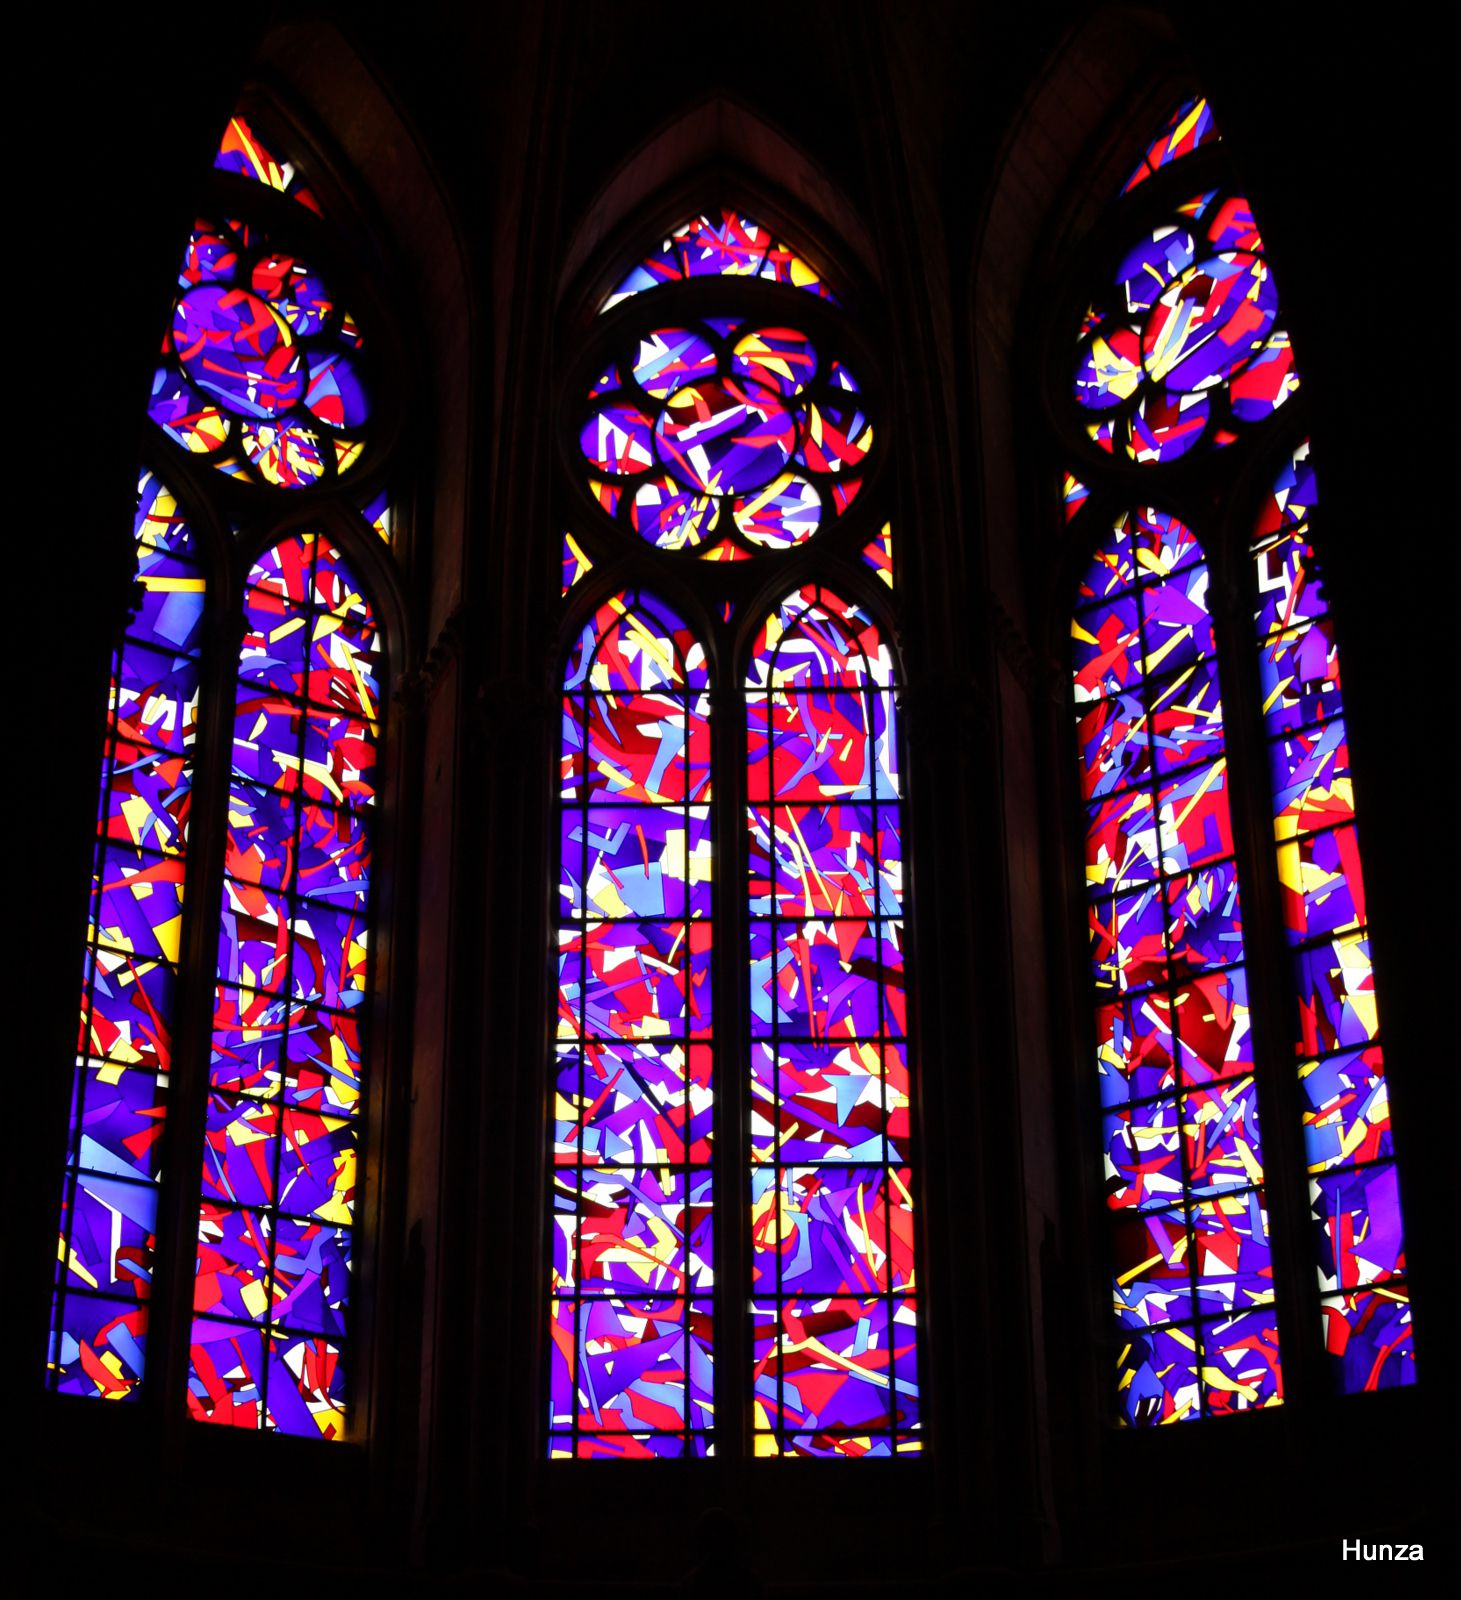 Cathédrale de Reims, vitraux d'Imi Knoebel